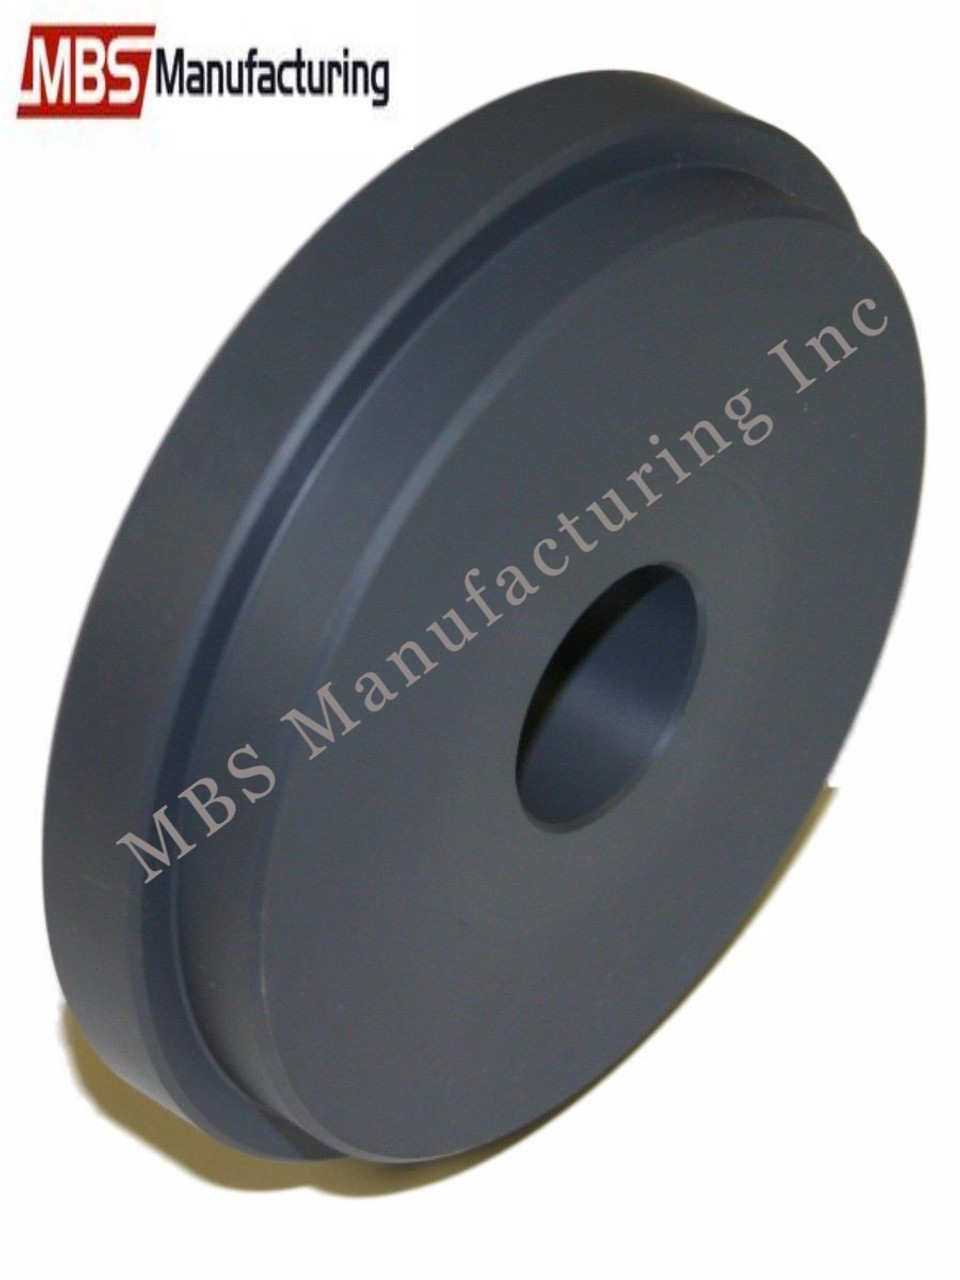 Bellow Ring/ Retainer Sleeve Installation Tool For Mercruiser, Alpha, Bravo